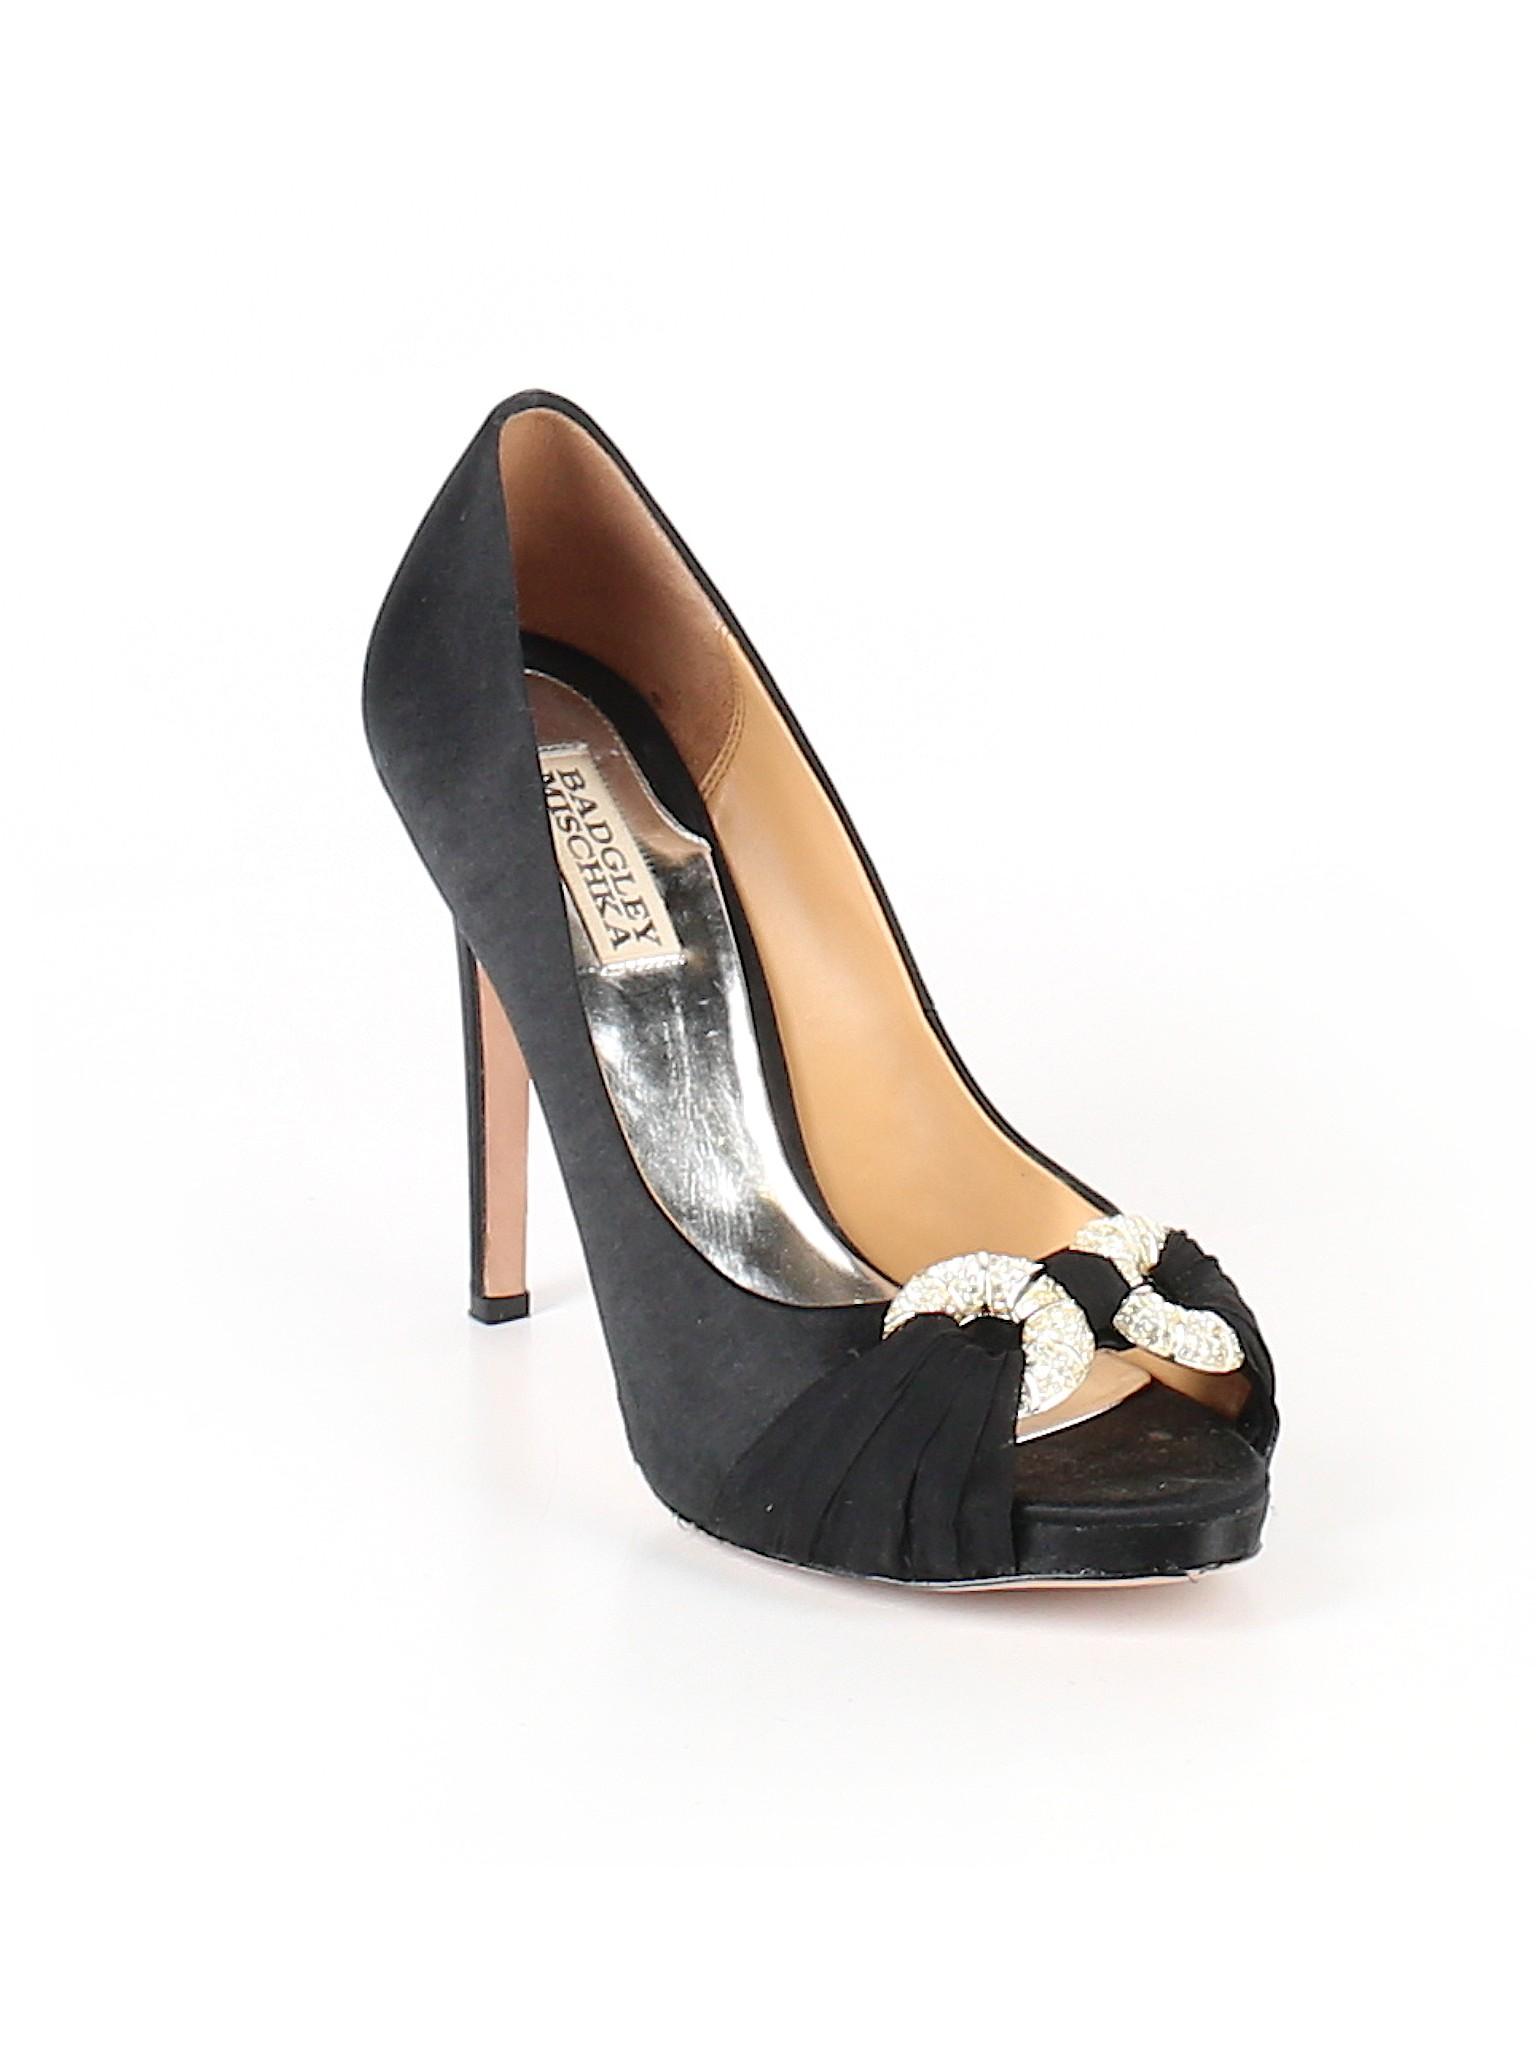 Boutique Boutique Mischka Badgley promotion Heels promotion 6xwvzY